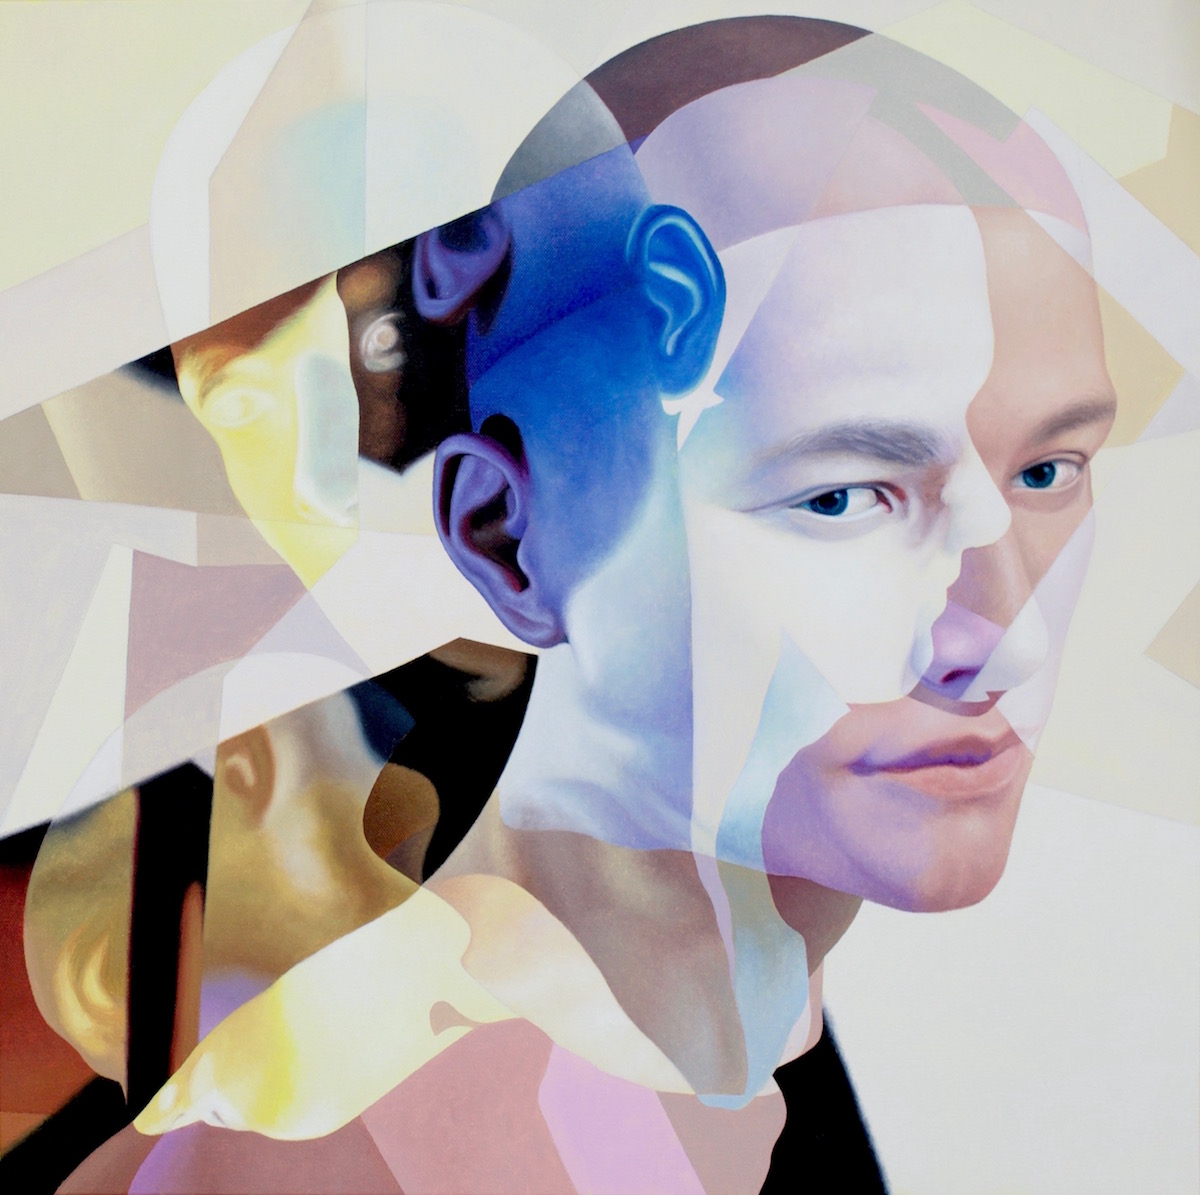 """Sunlight Spirit"", 24x24 in., Oil on canvas, 2018"